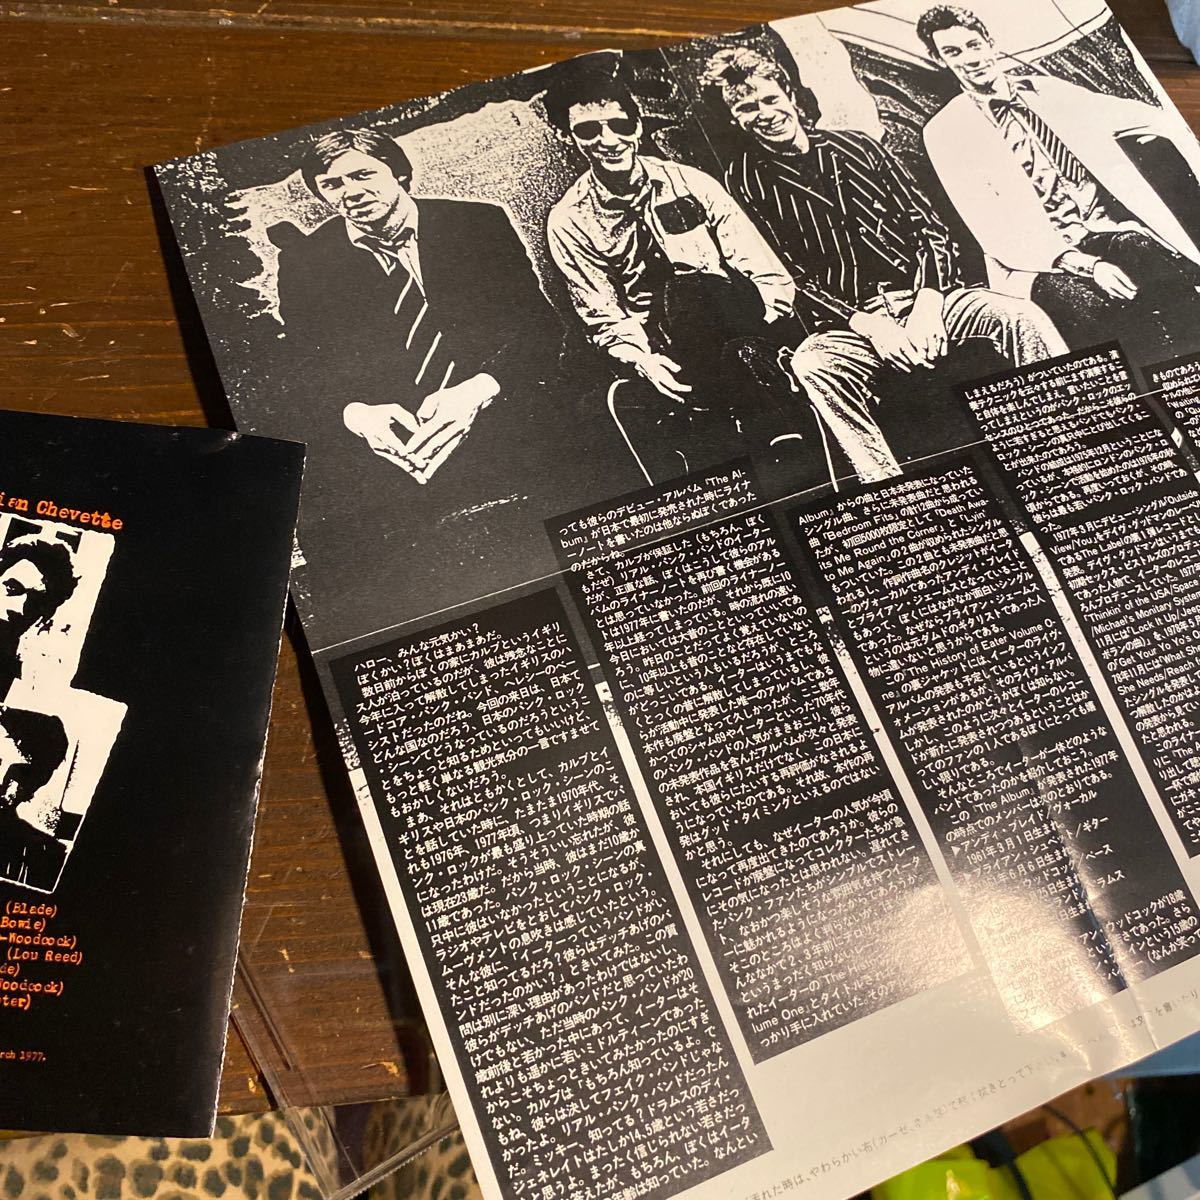 EATER . THE ALBUM 国内盤 発売元 EDISON LTD ._画像4